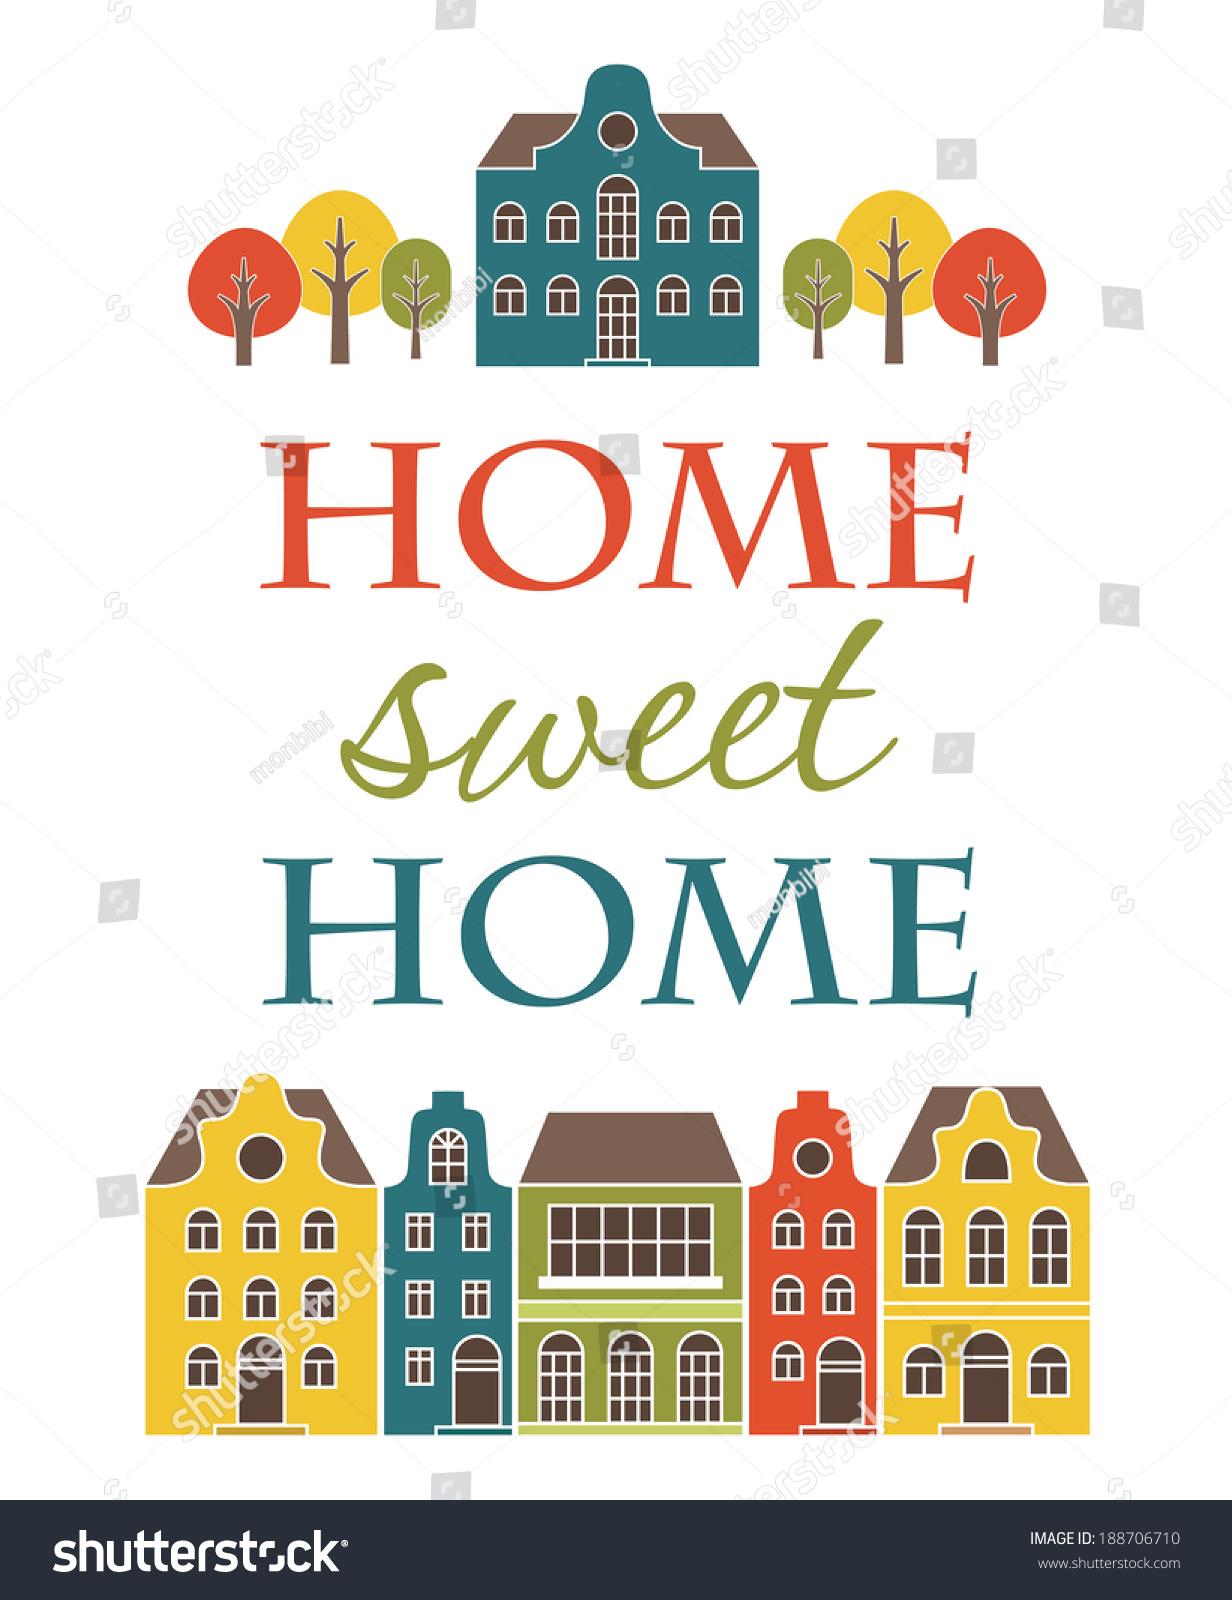 Home Sweet Home Card Design Vector Stock Vector 188706710 - Shutterstock